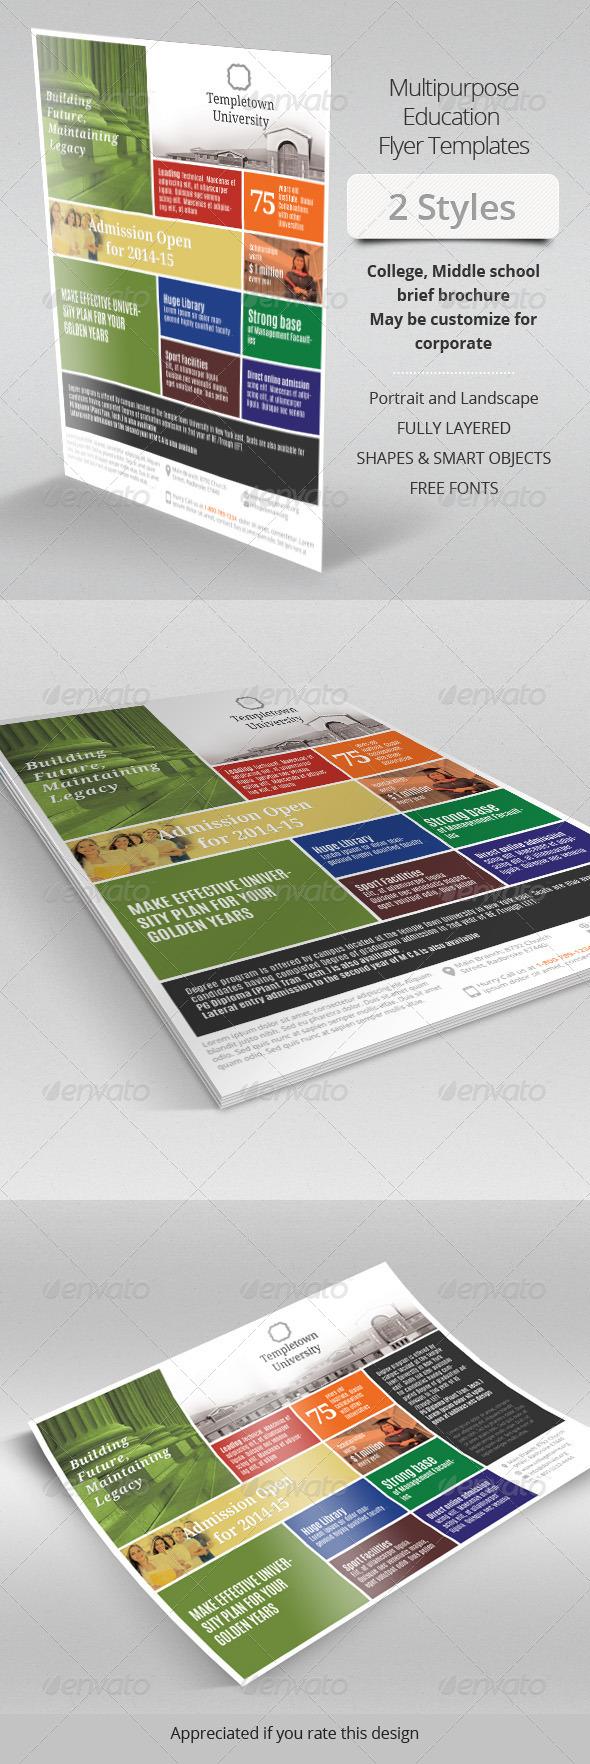 GraphicRiver Multipurpose Education Flyer 7767695